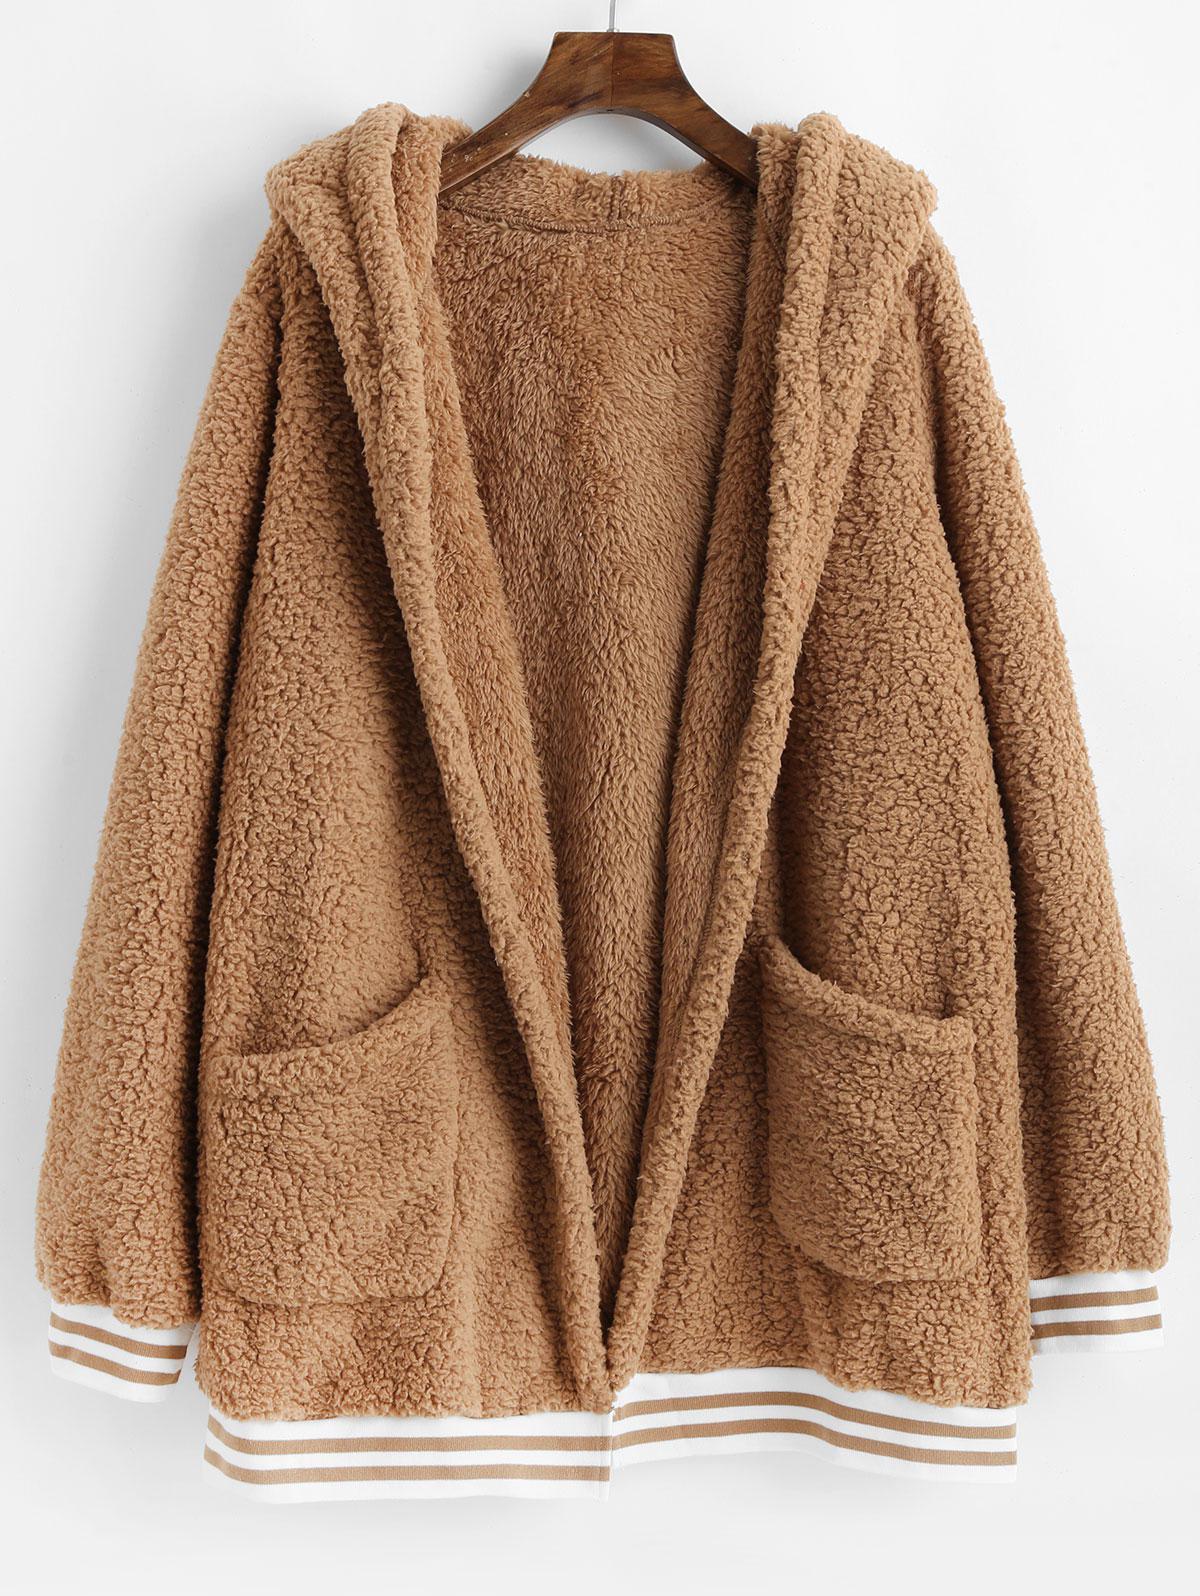 Striped Hem Pockets Hooded Faux Fur Coat